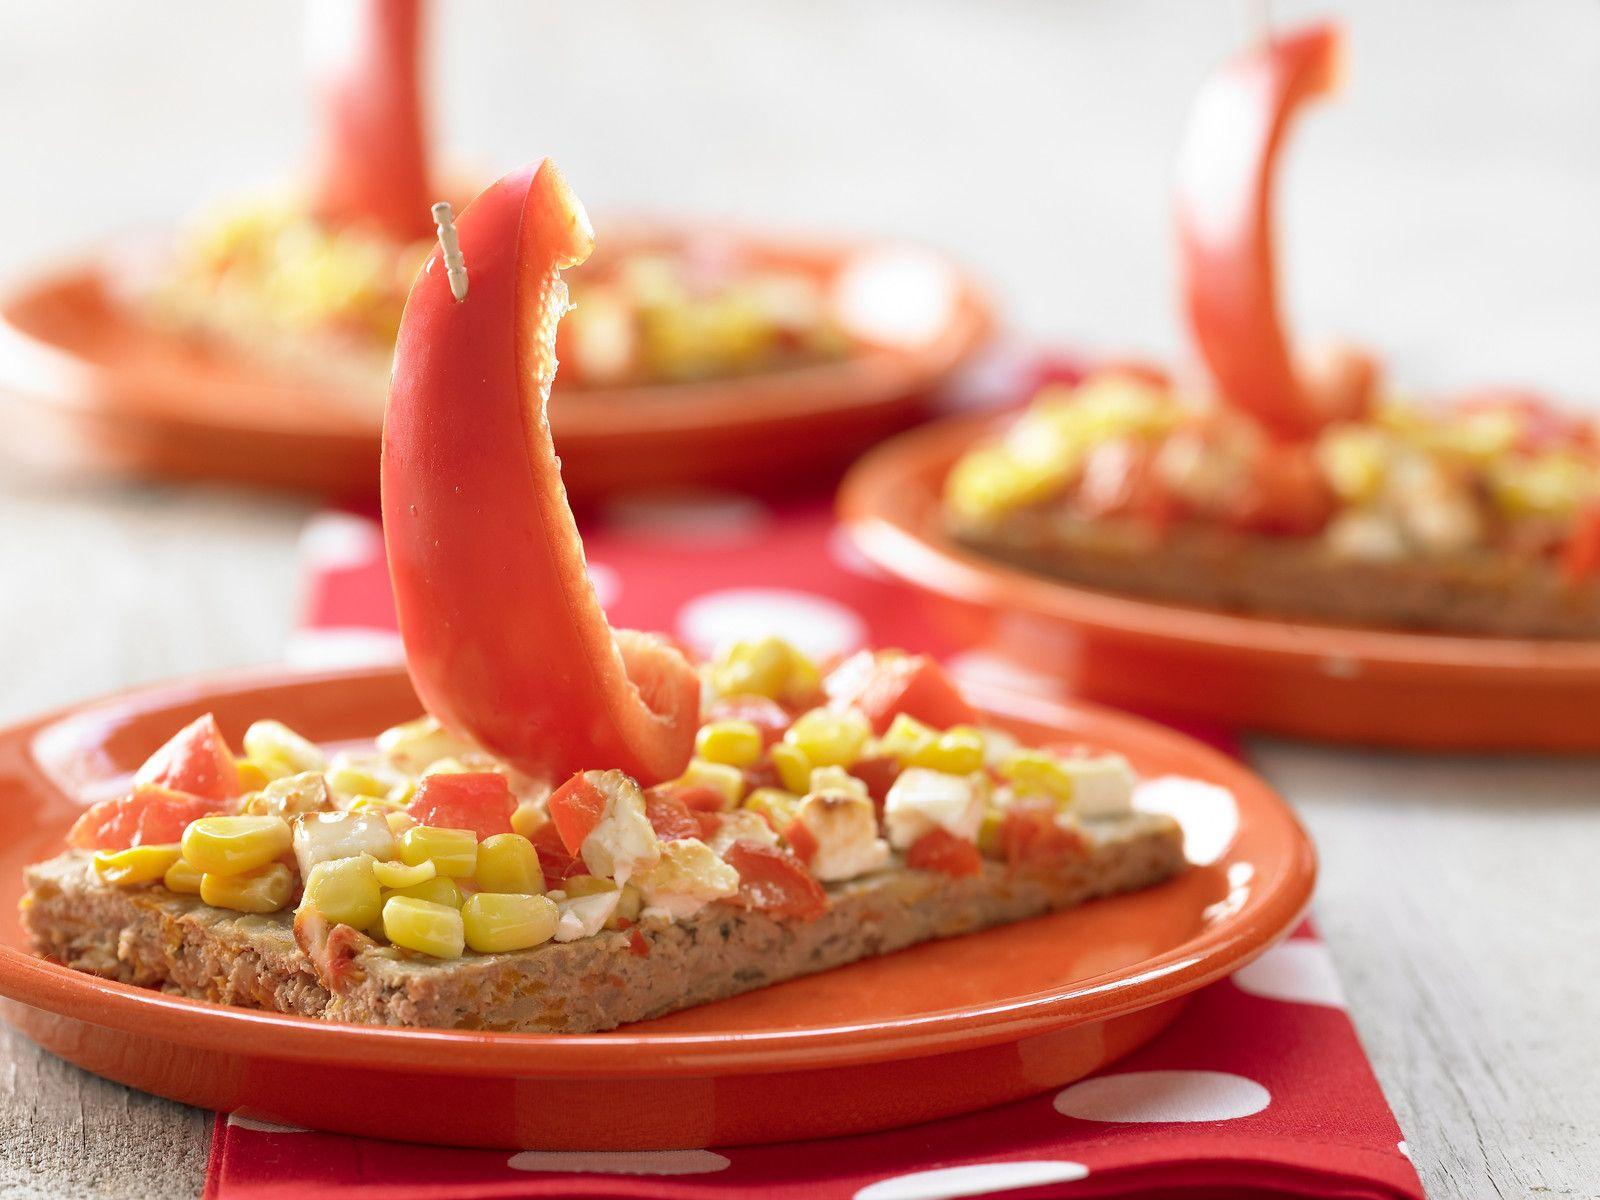 Hack-Gemüse-Boote | Kalorien: 281 Kcal - Zeit: 40 Min. | http://eatsmarter.de/rezepte/hack-gemuese-boote